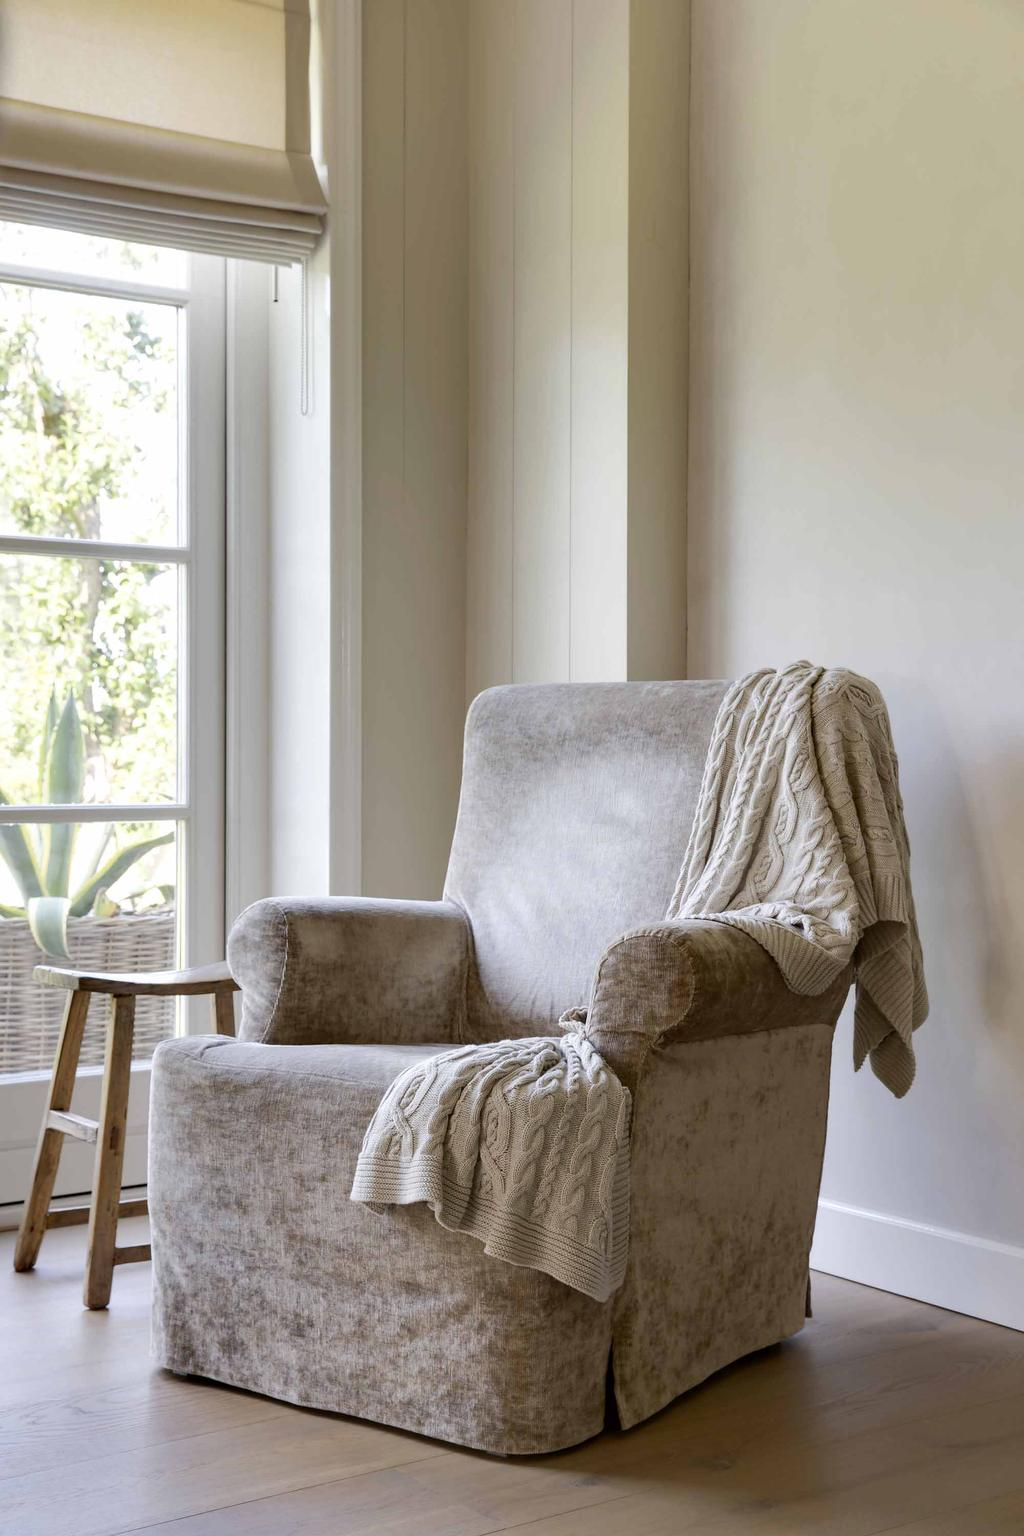 fauteuil krukje